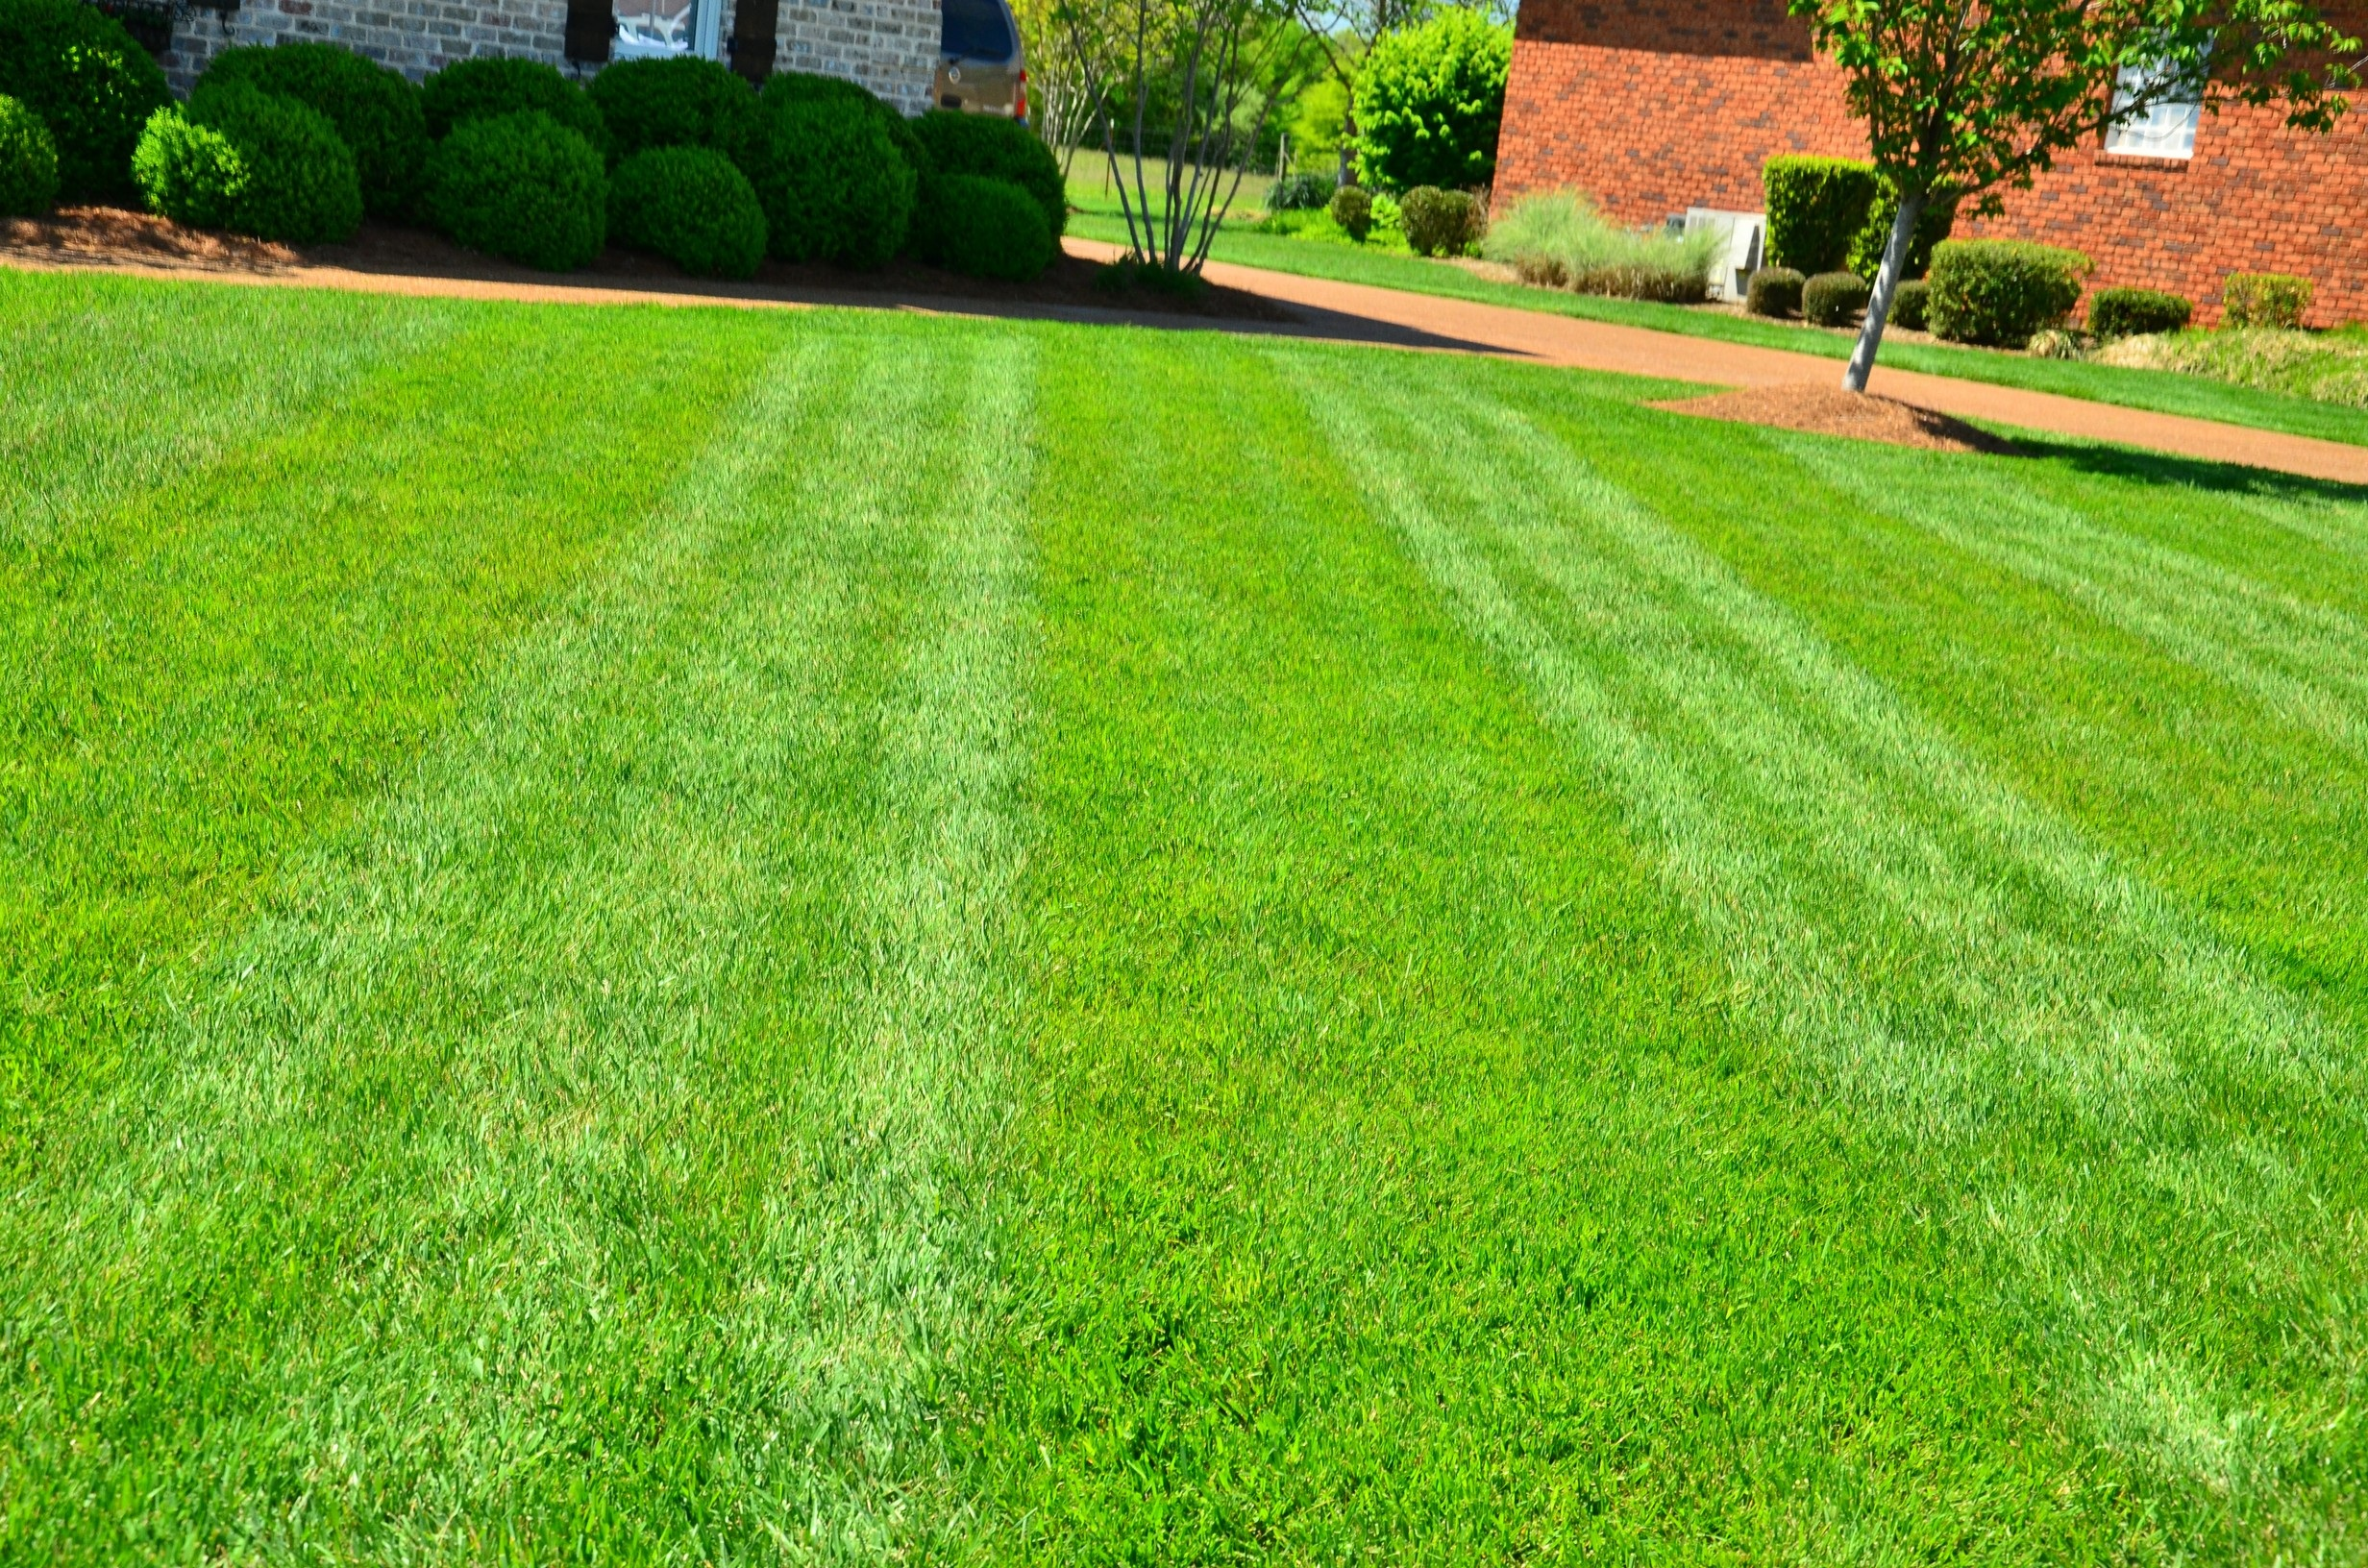 lawn-care-1.jpg